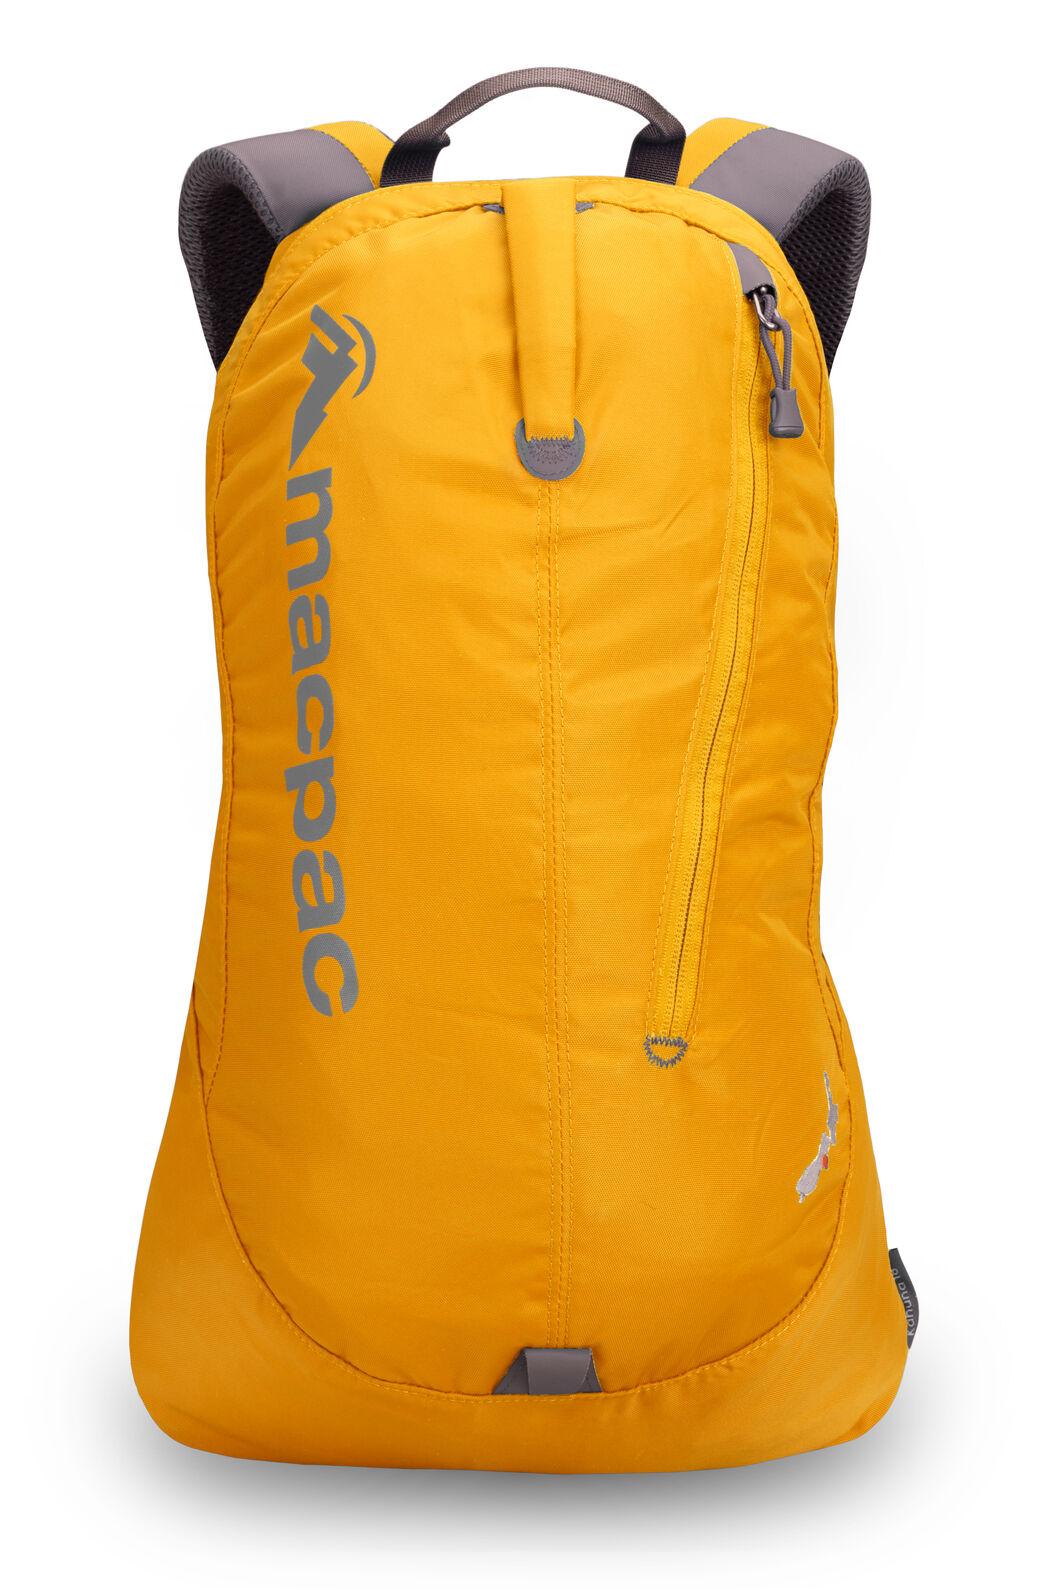 Kahuna 18L Hiking Day Pack, Cadmium Yellow, hi-res